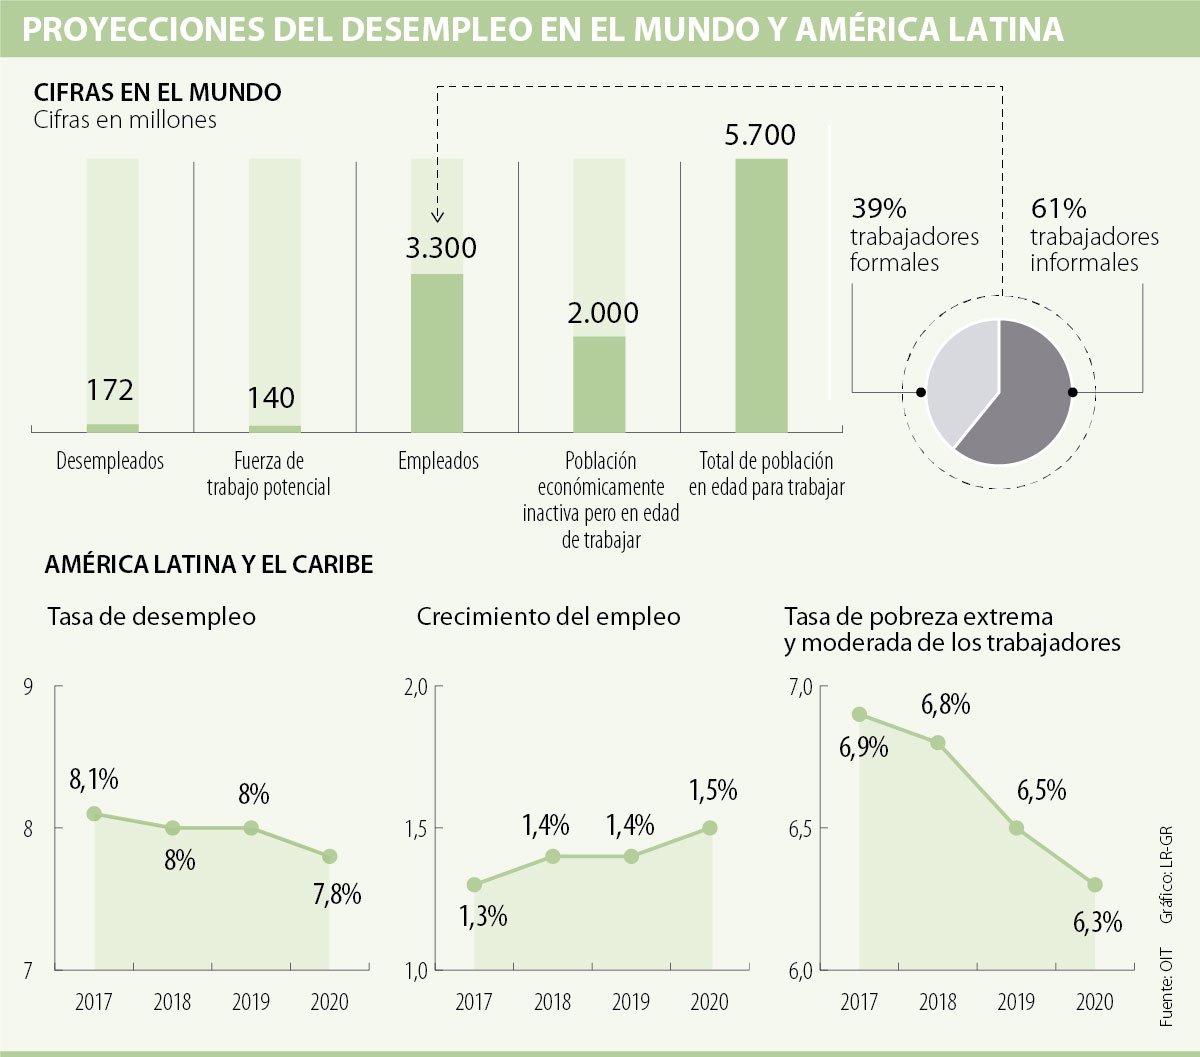 Causas de alta tasa de desempleo